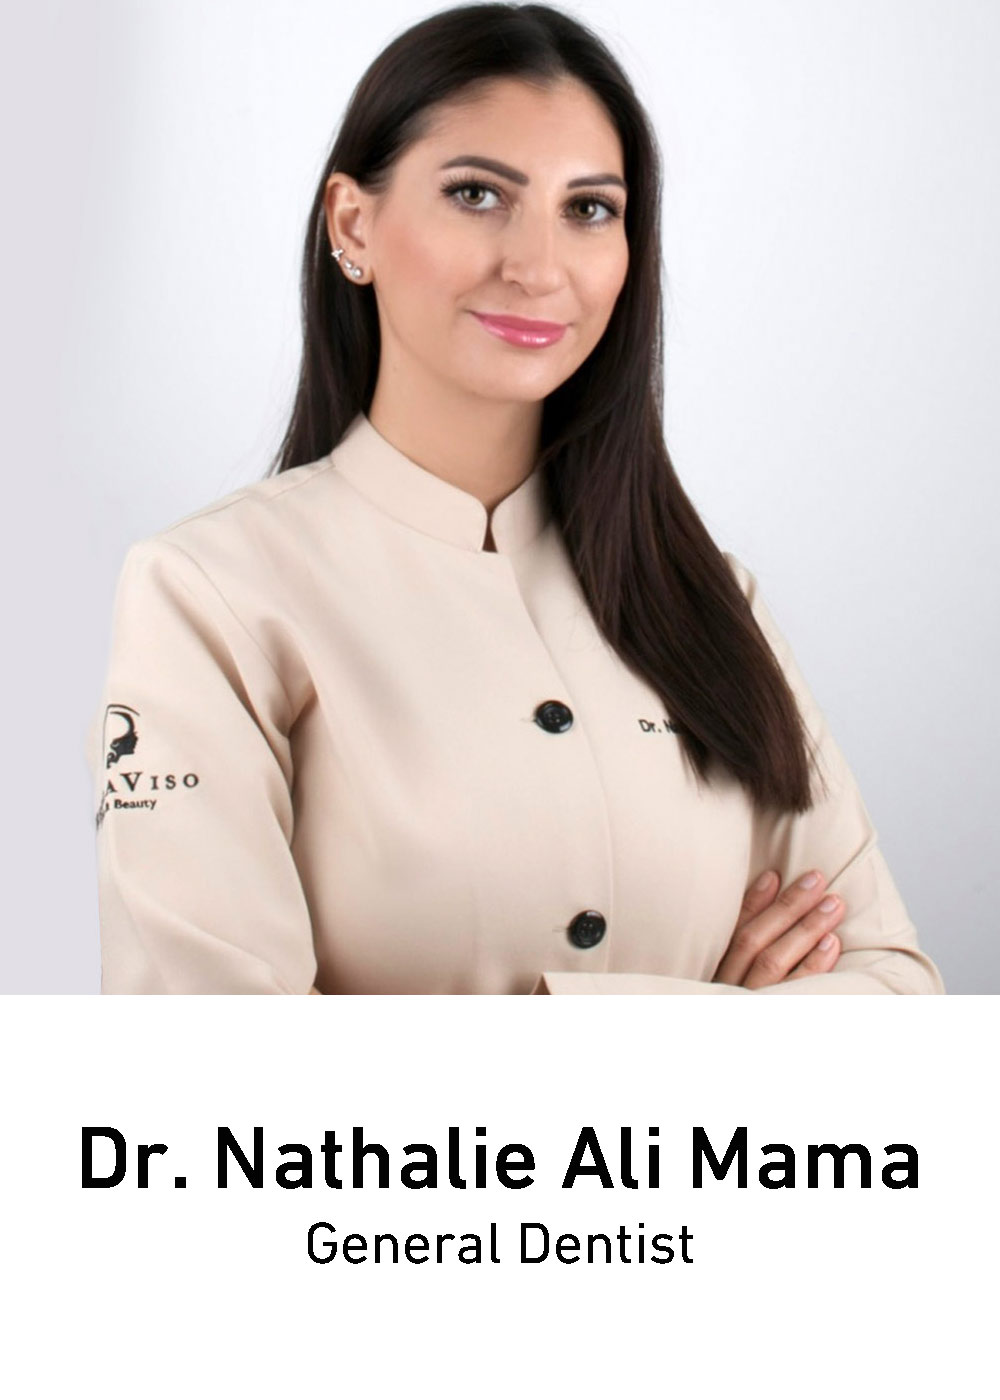 Dr-Nathalie-Ali-Mama